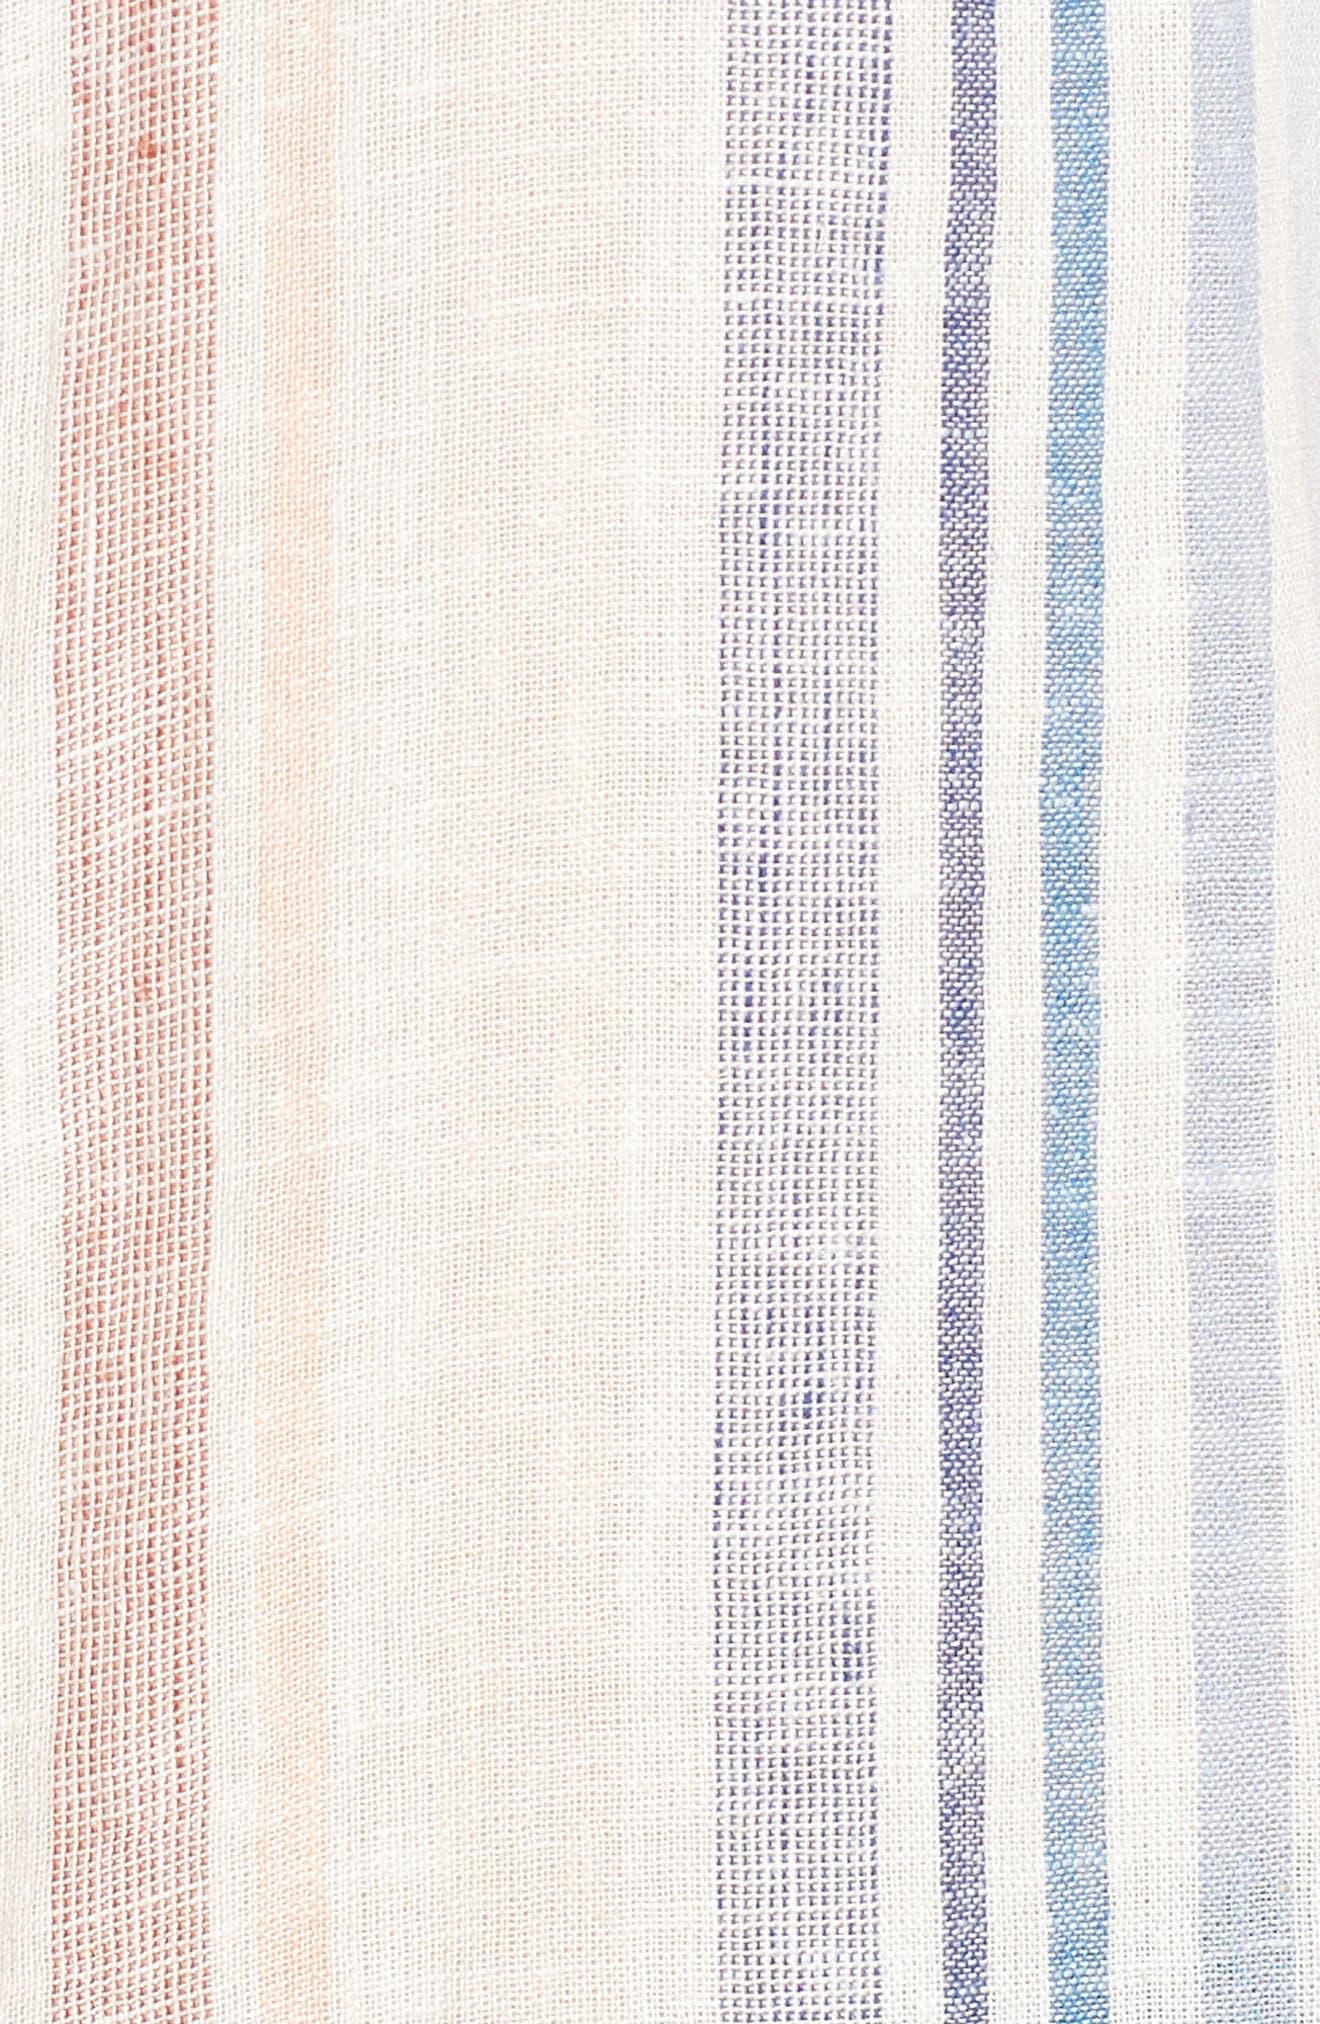 Multistripe Tie Front Top,                             Alternate thumbnail 6, color,                             400